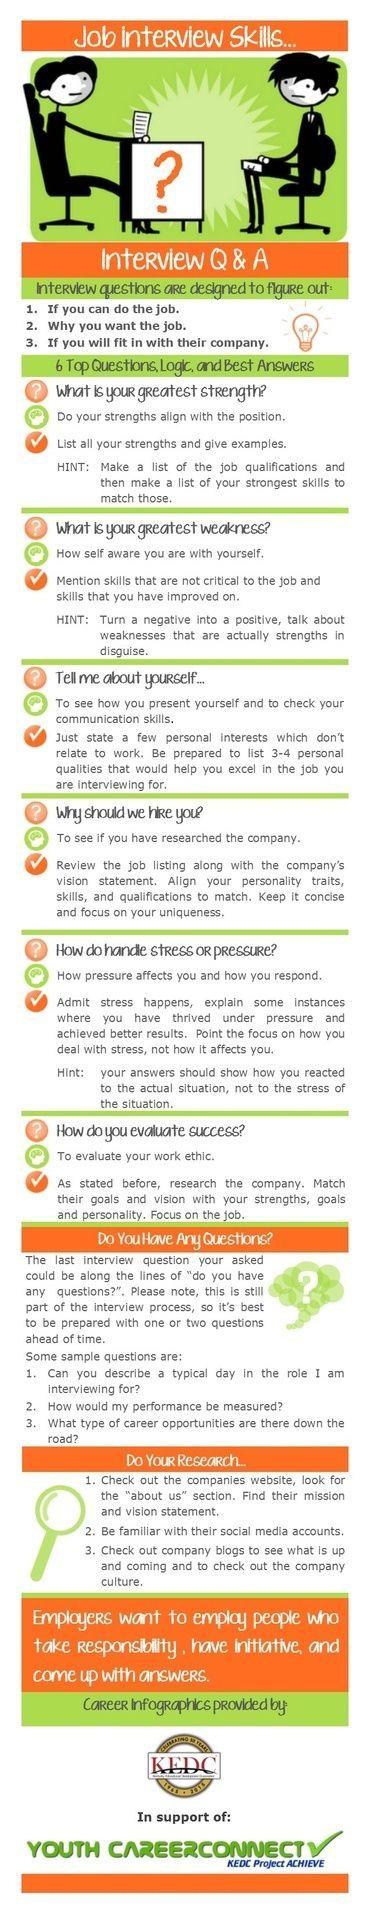 Medical Resume Template Cover Letter for MS Word Best CV Design - resume mission statement